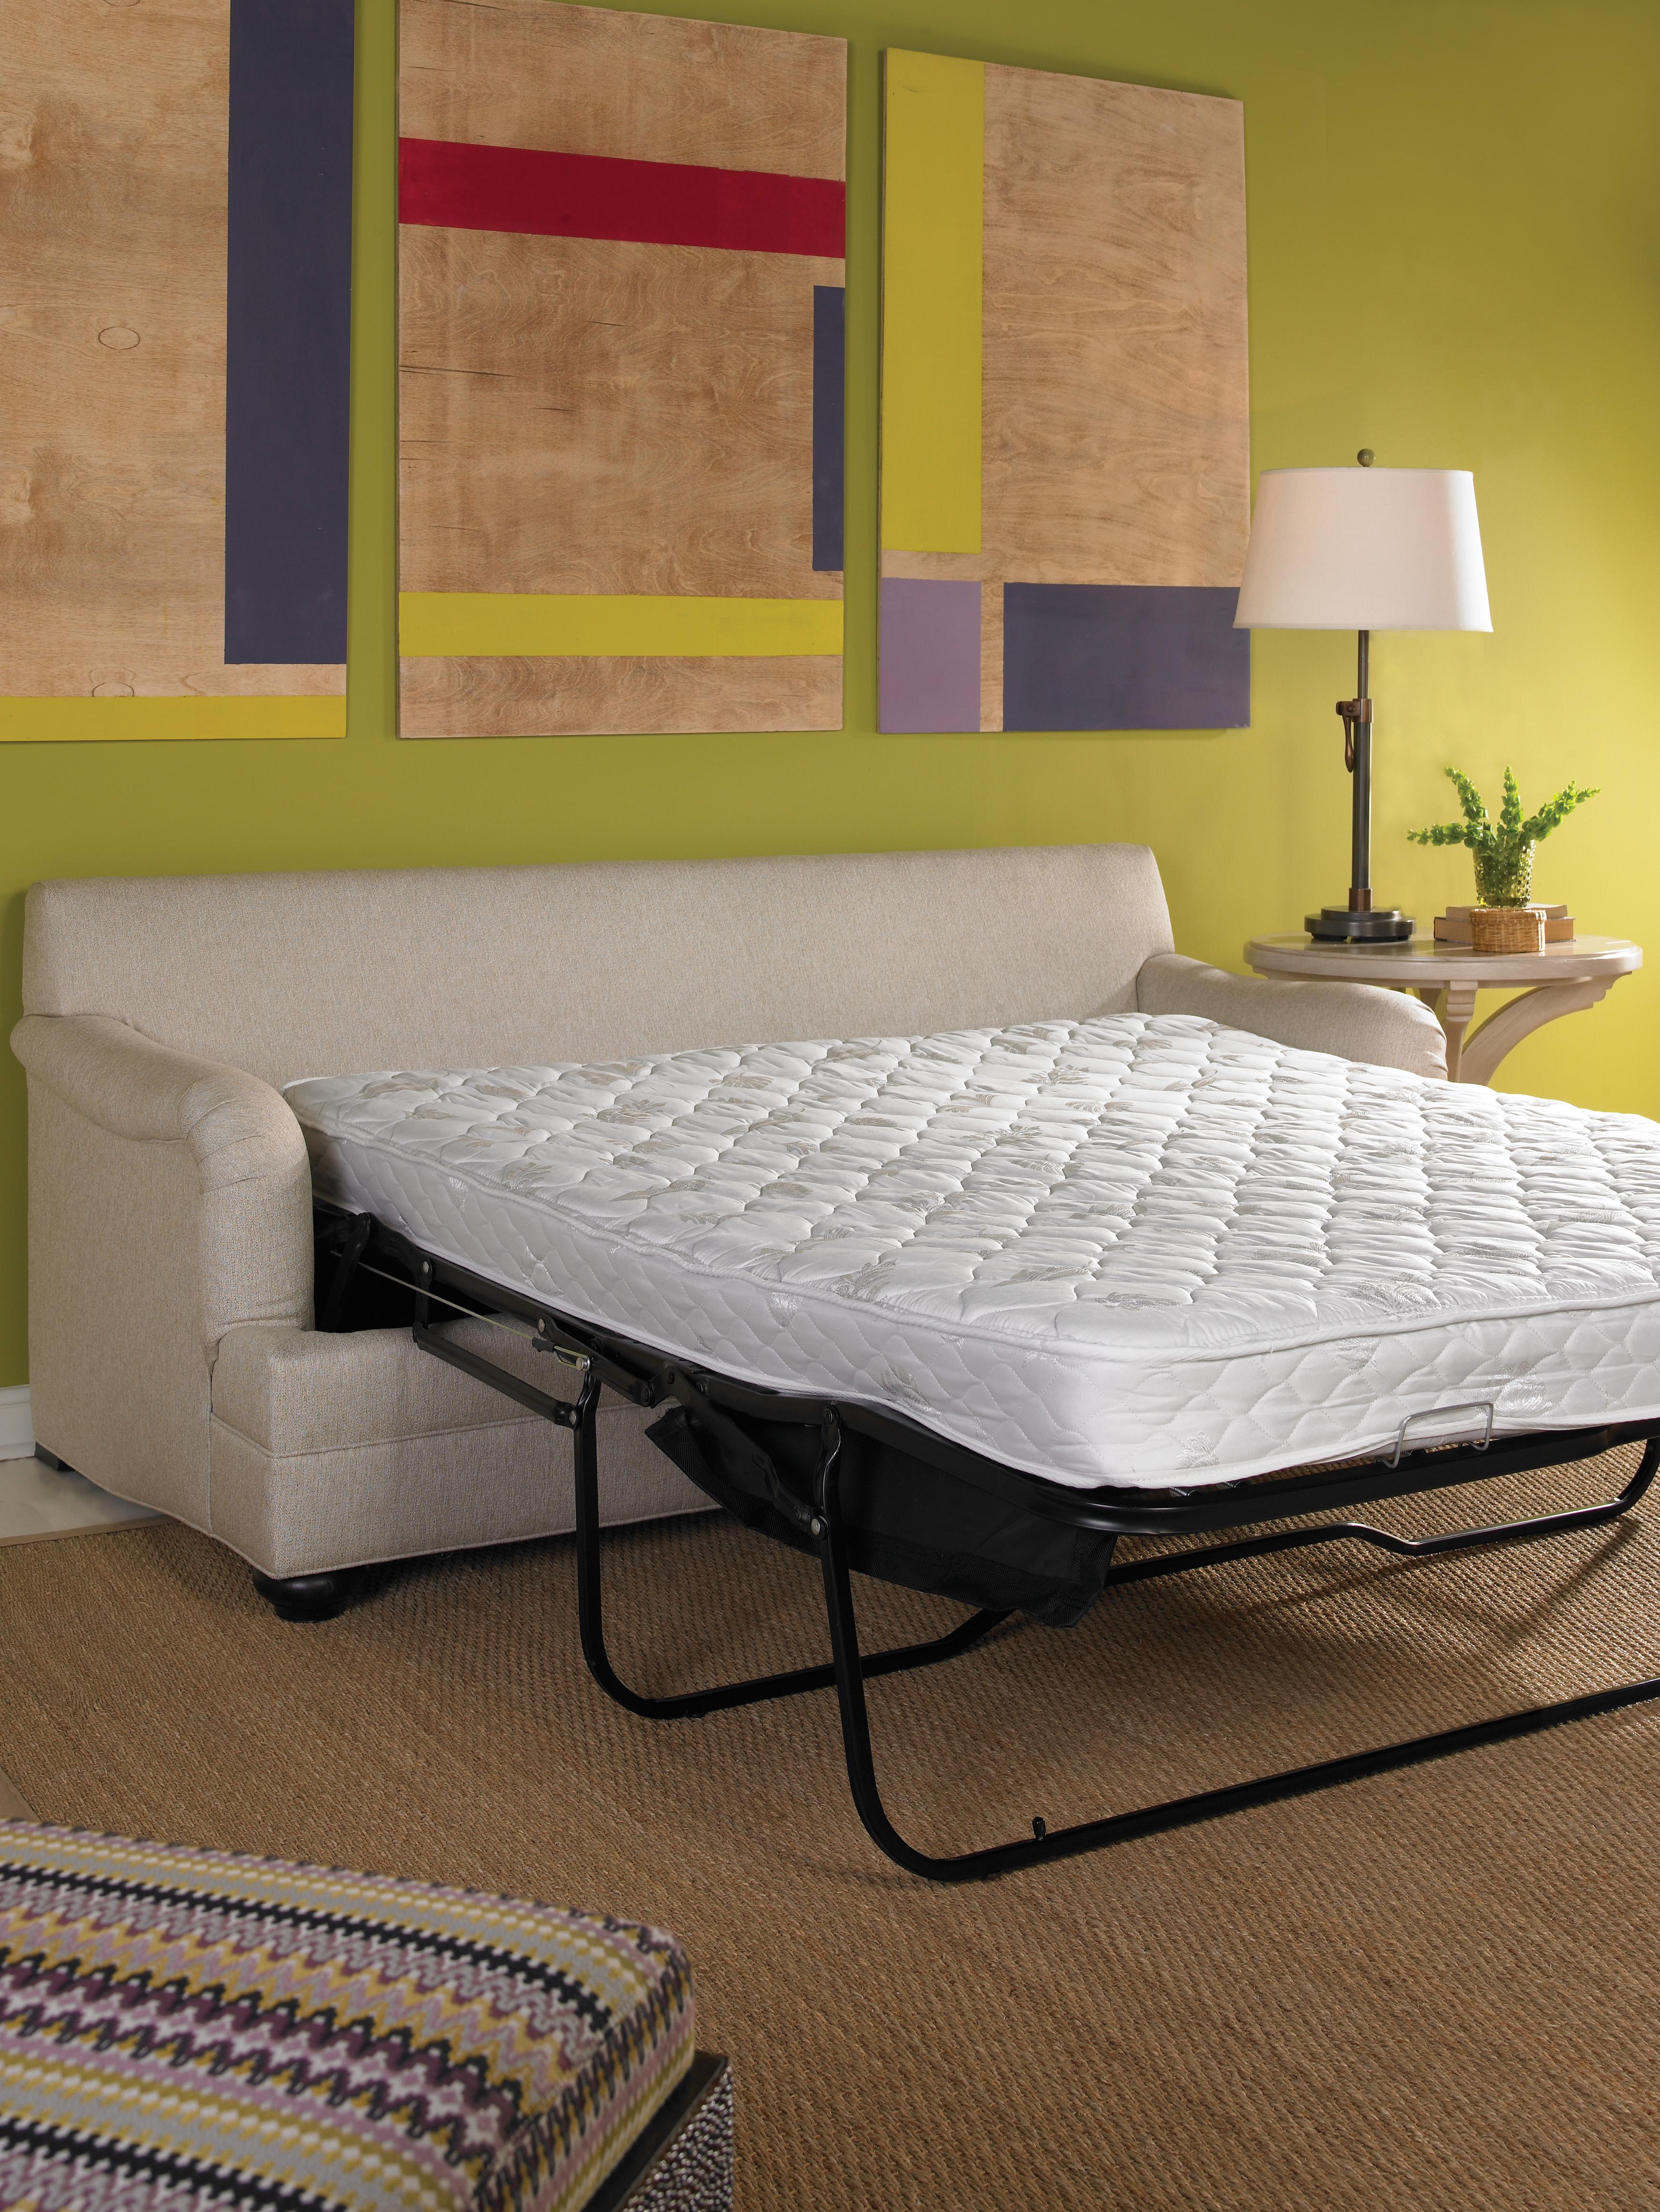 Clarke Fabric Sectional Sofa Living Room: East Lake Sleep Sofa 603-2SS